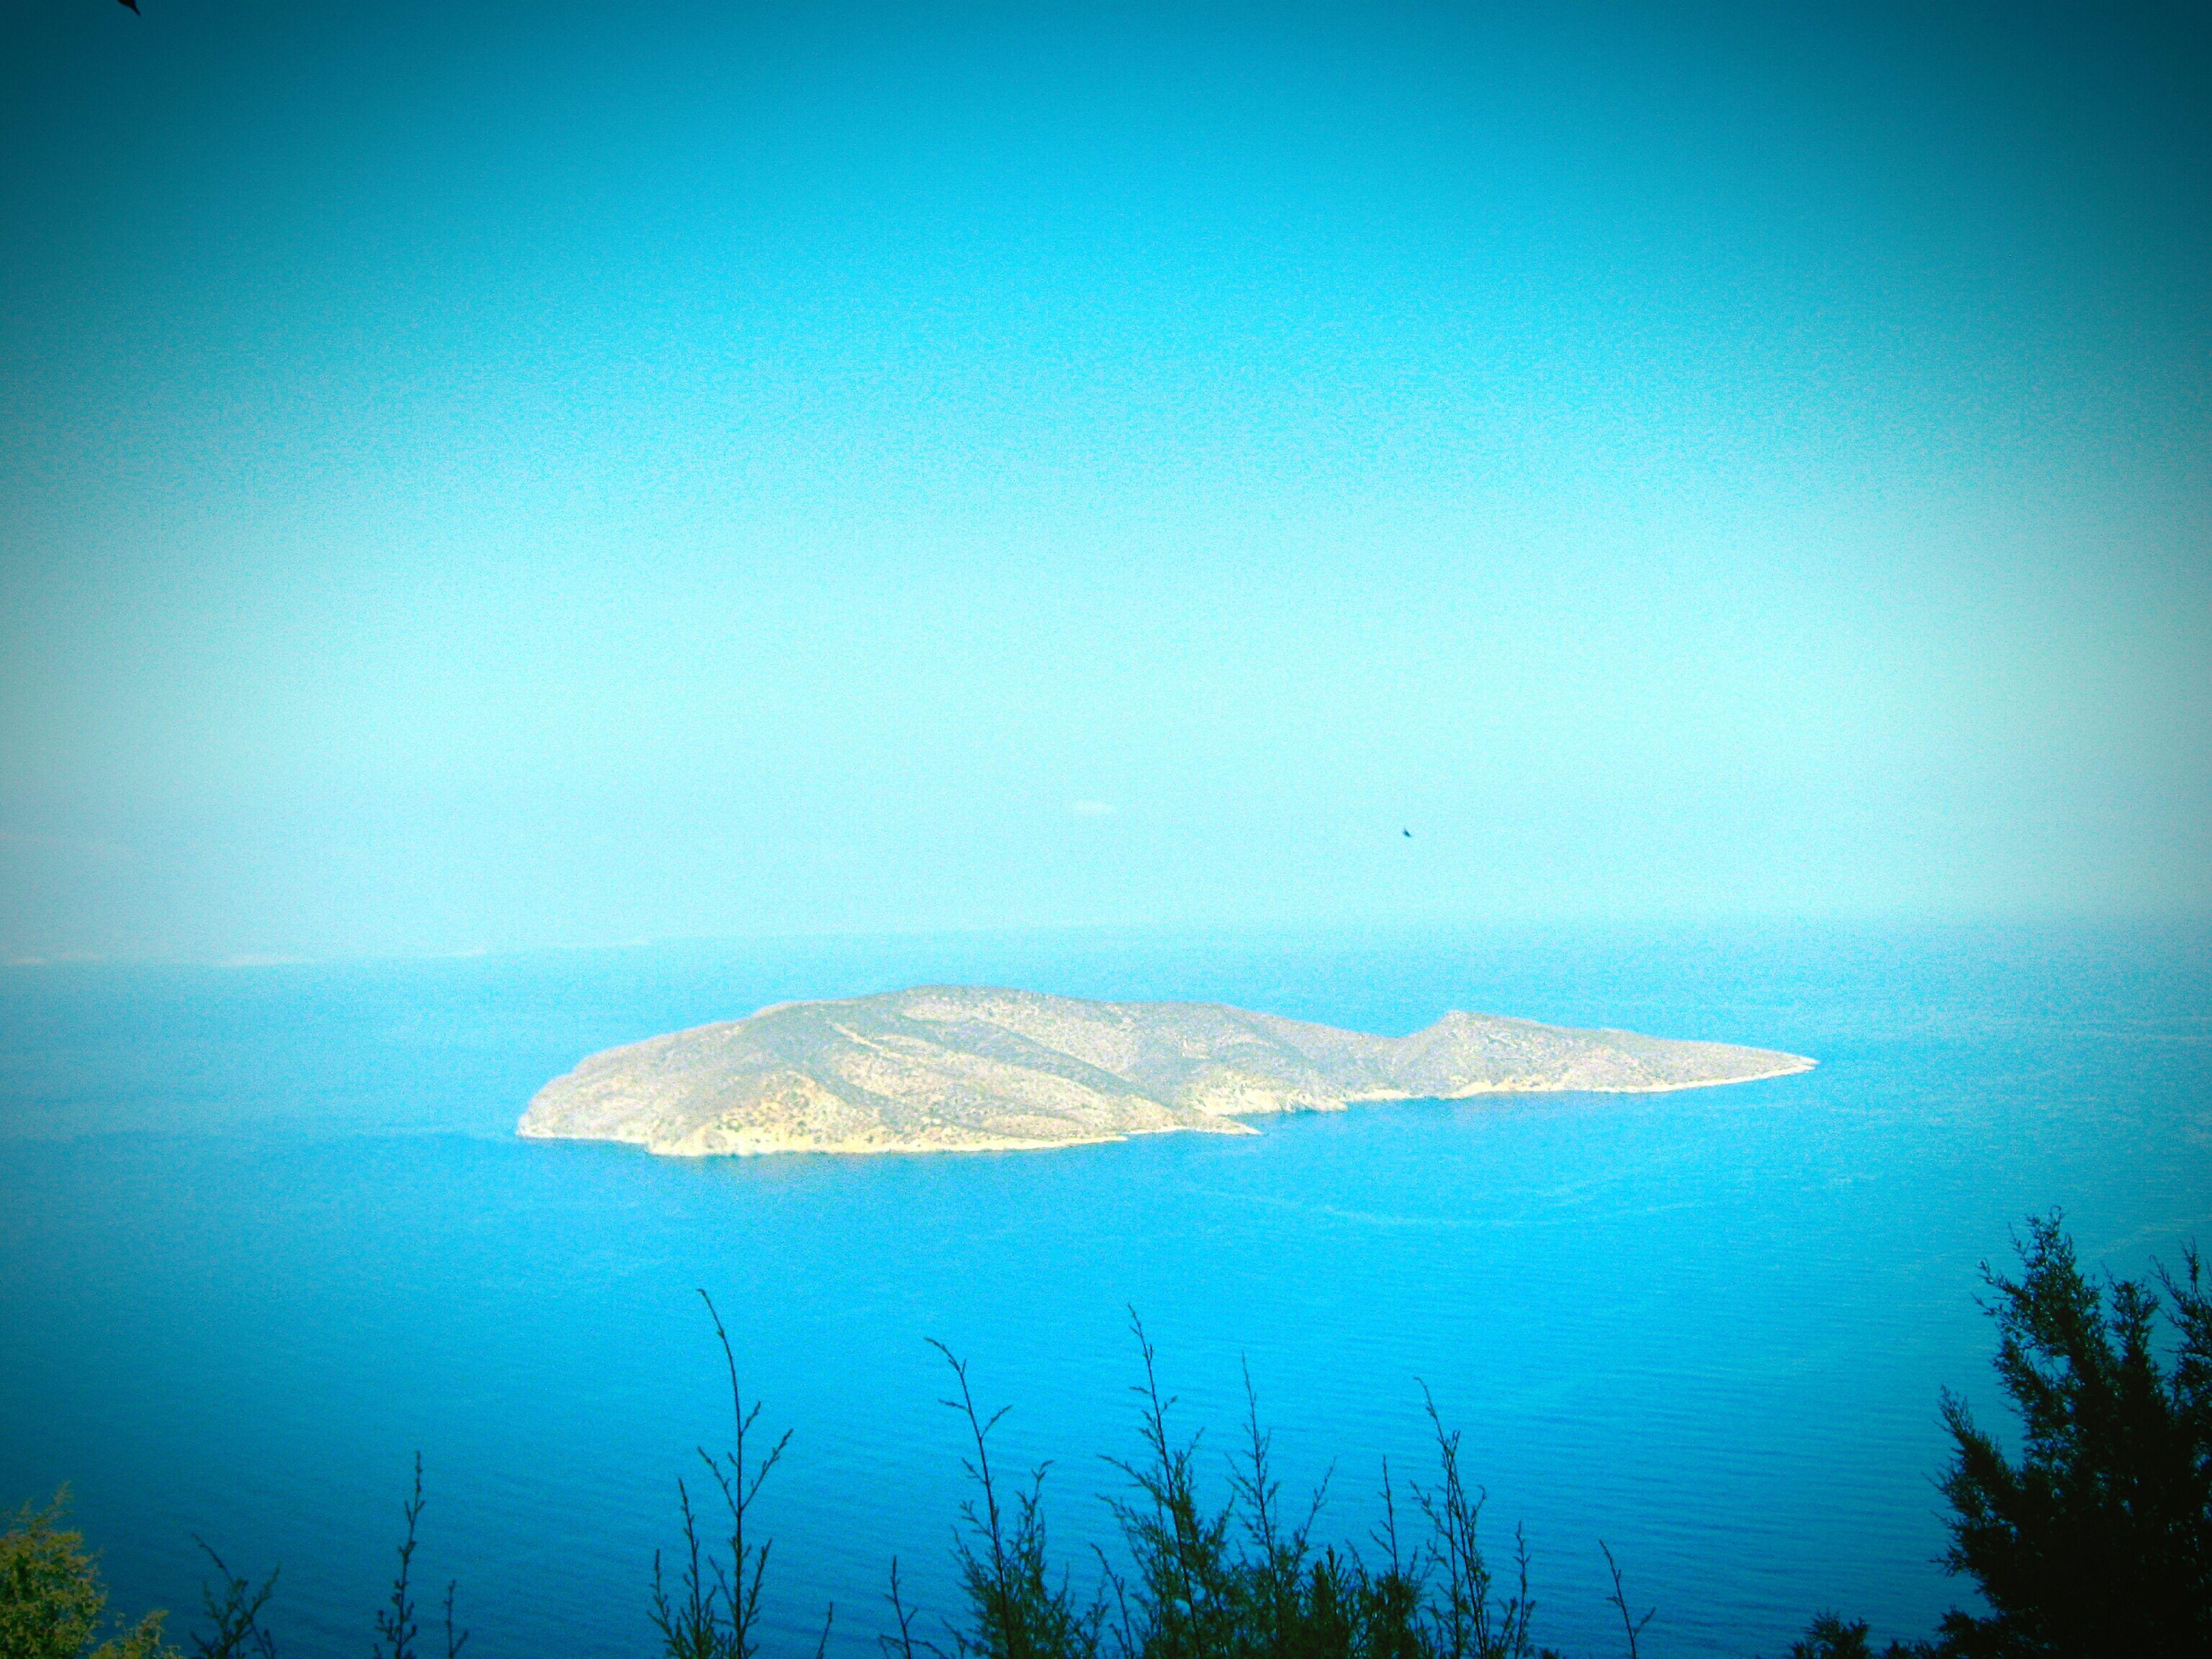 Beautifullandscape PseiraIsland Aegeansea Crete Greece Europe 2011